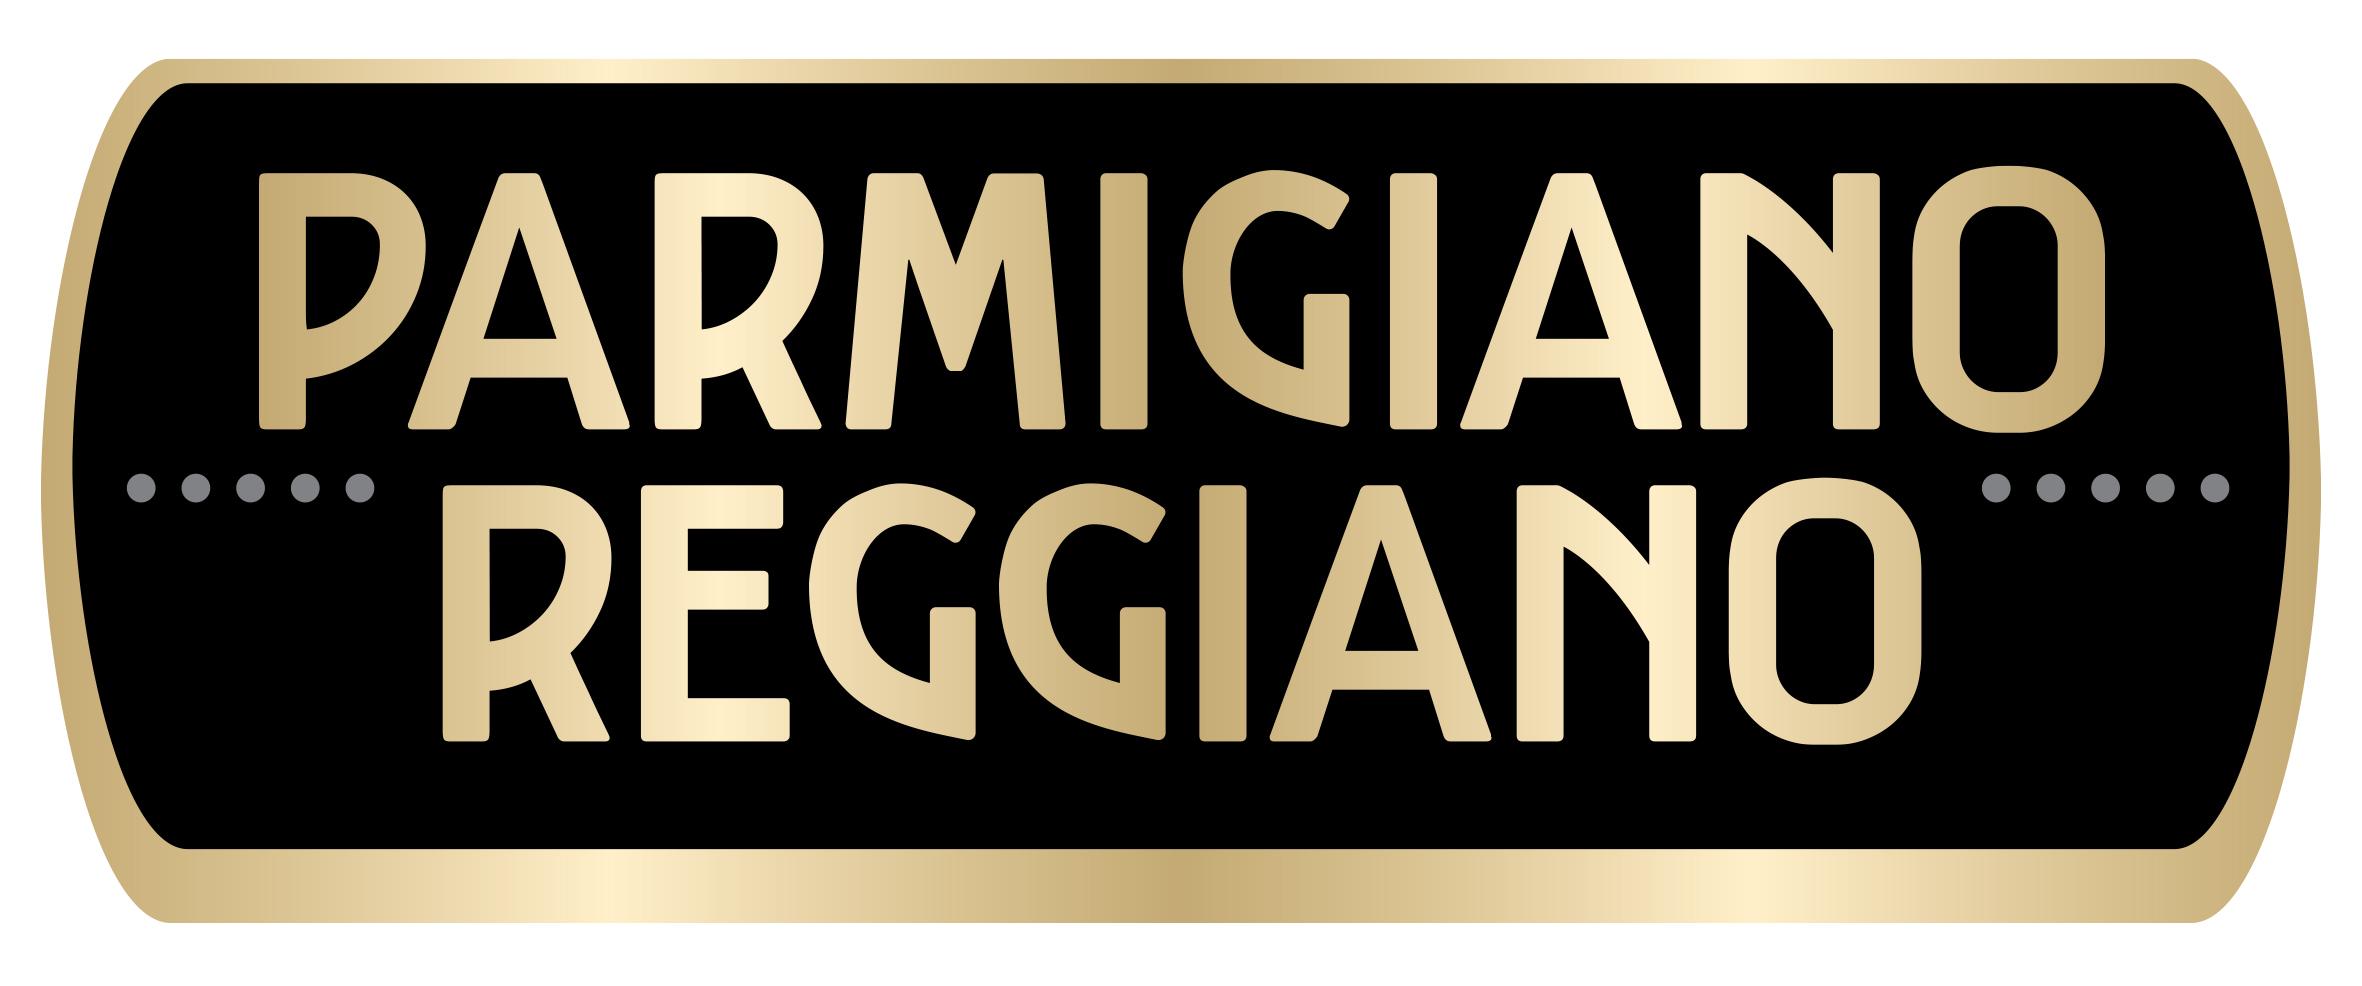 parmigianoreggiano_logo_id.jpg